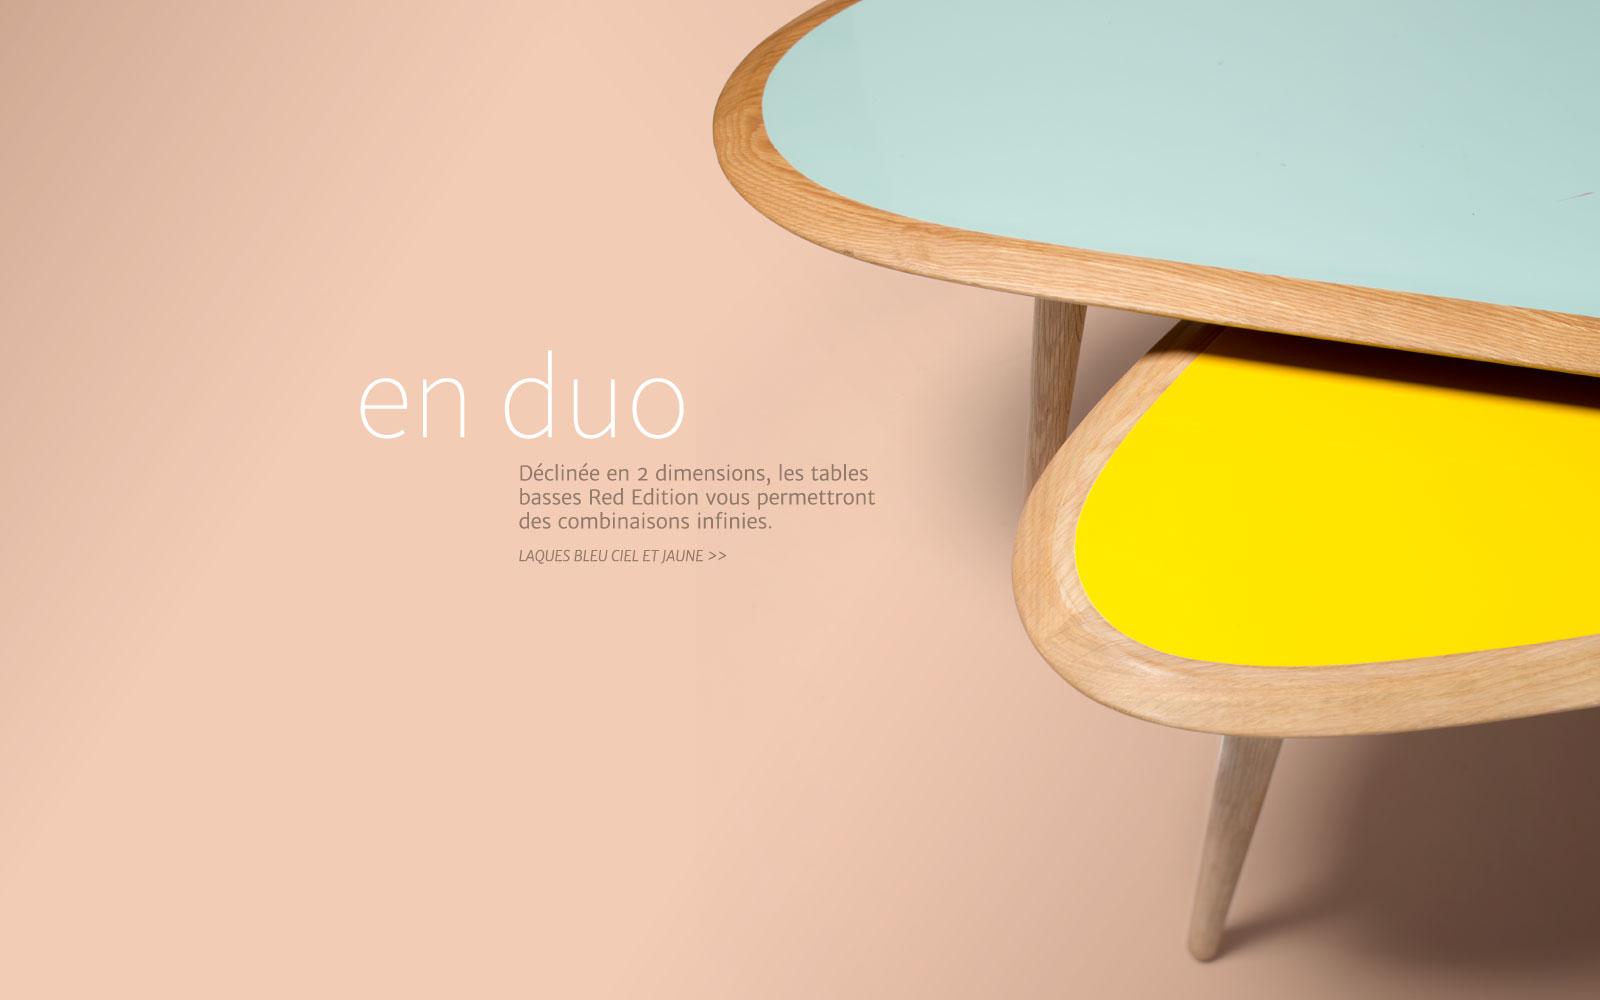 table basse scandinave vintage pas cher - atwebster.fr - maison et